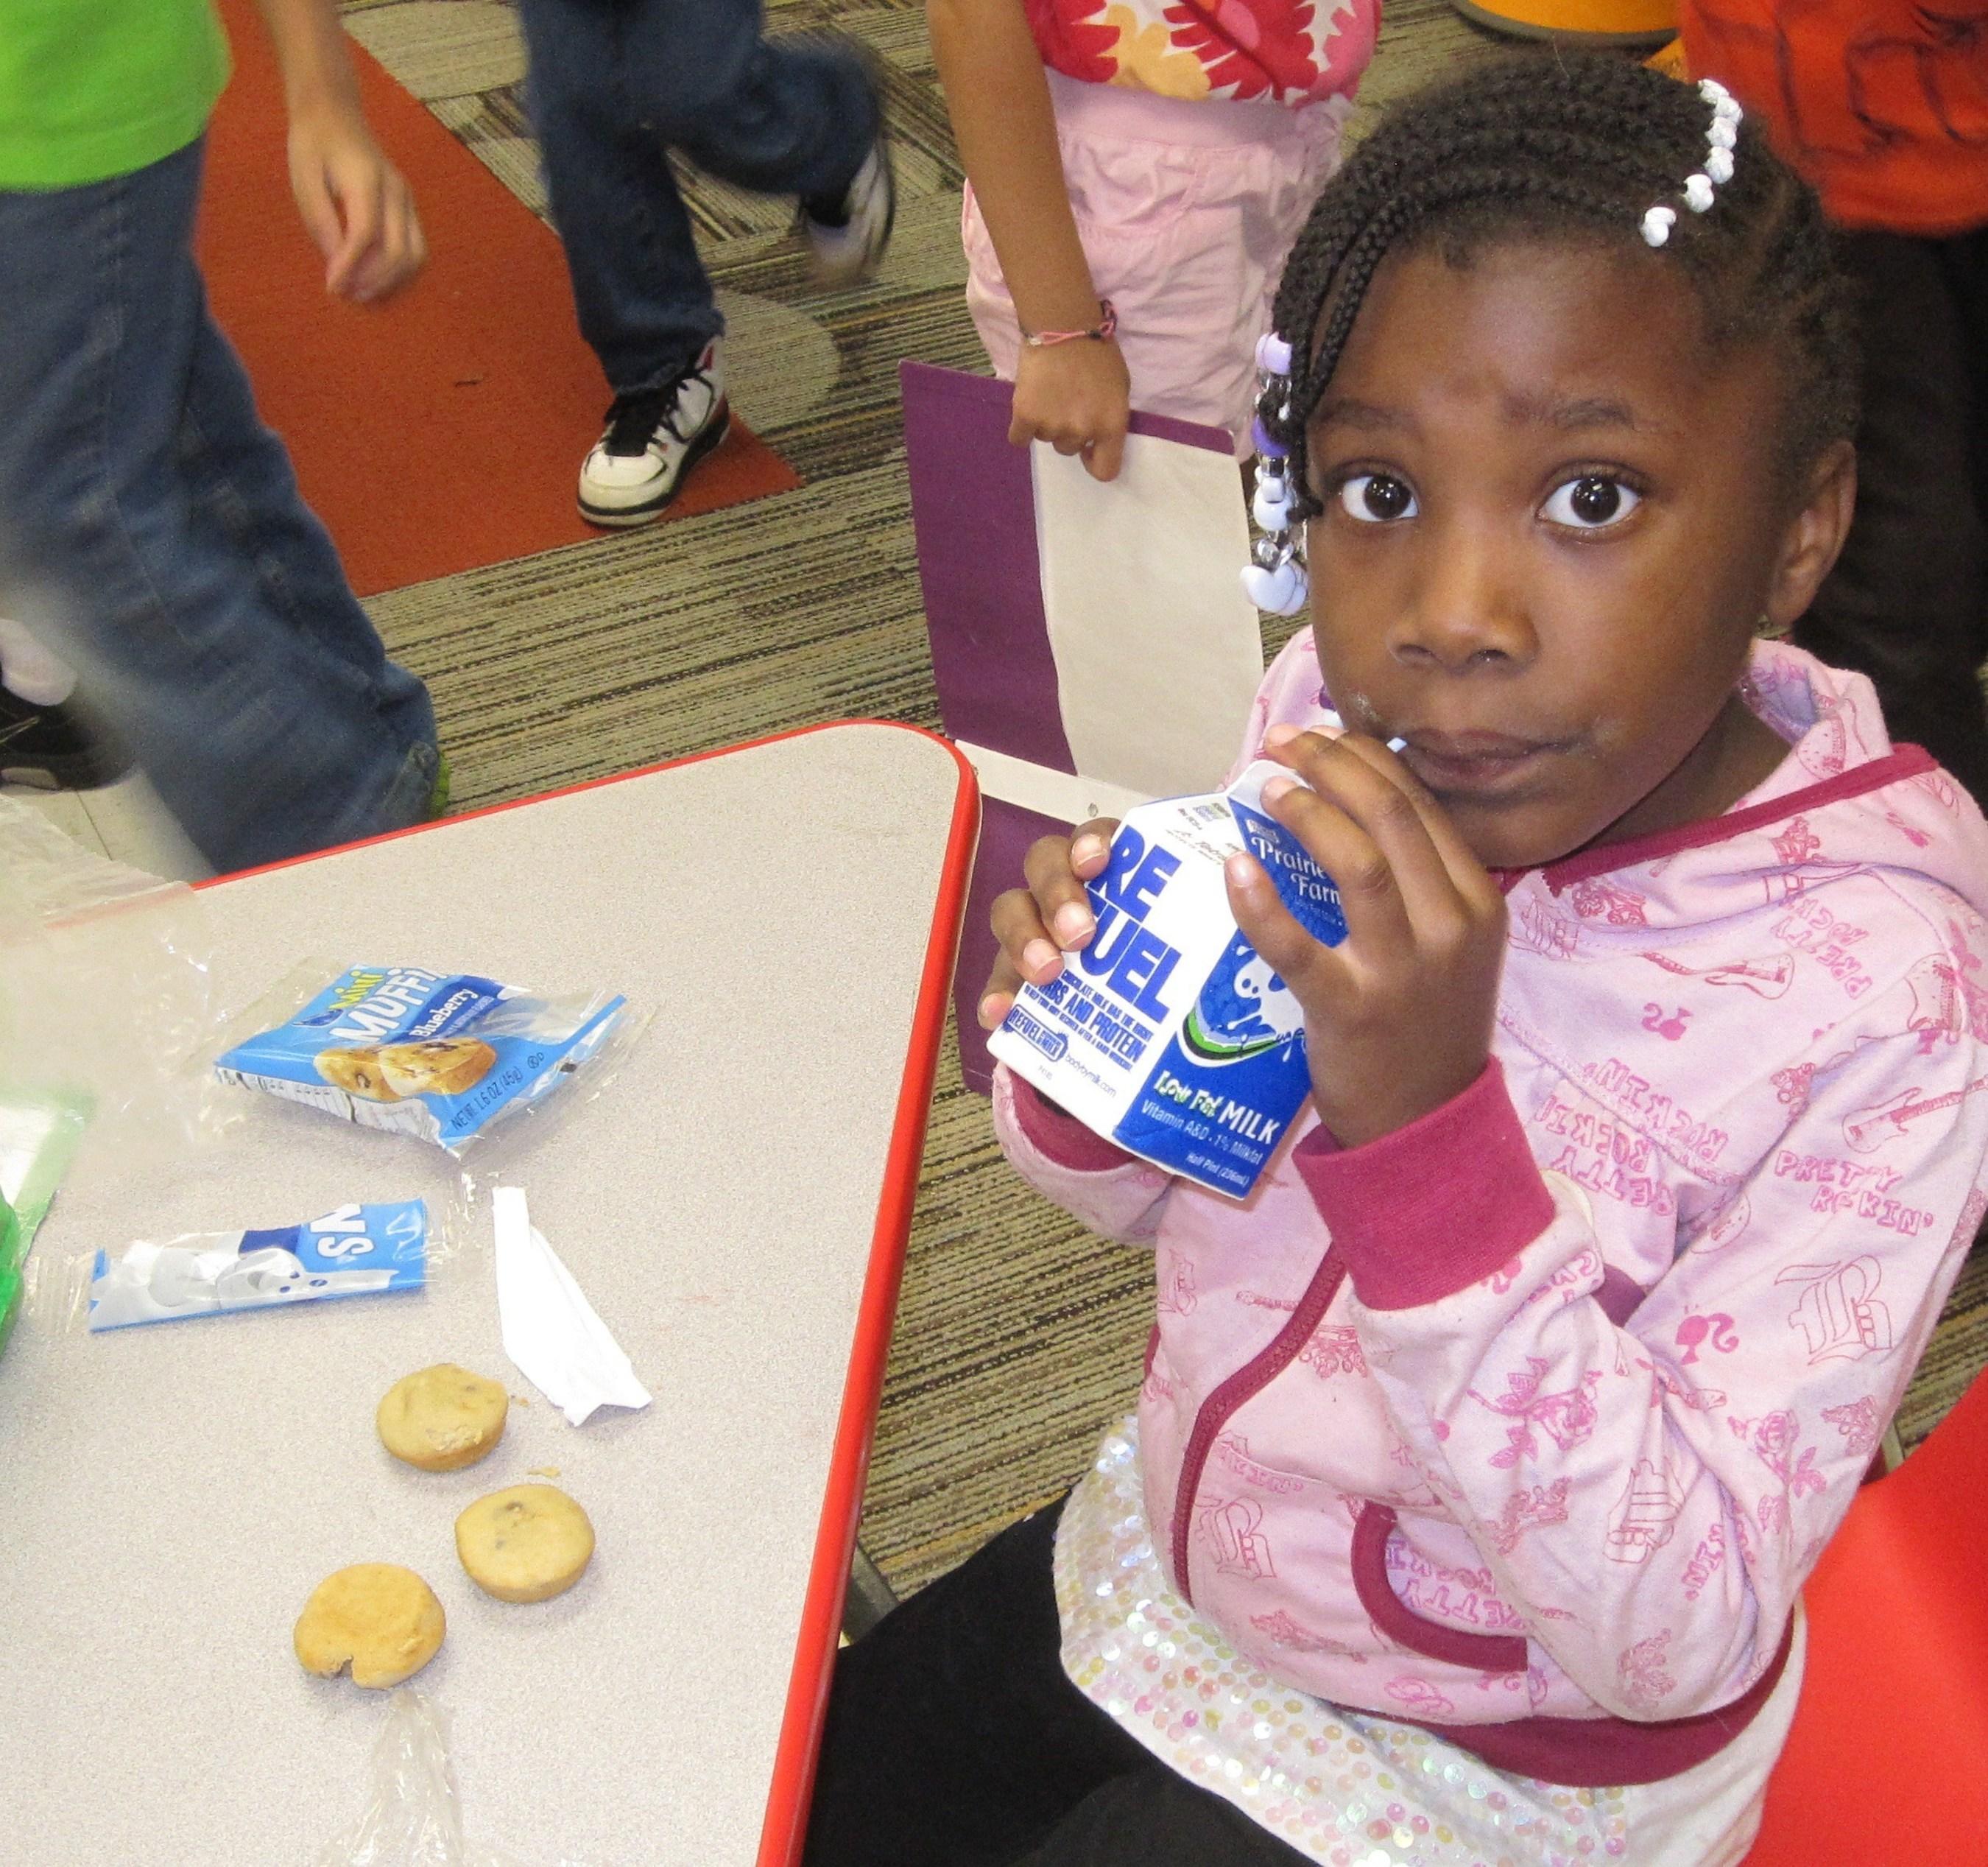 Last year, Churchill Elementary School in Glen Ellyn, Ill. used its National Dairy Council Fuel Up Breakfast Grant to enhance its Breakfast in the Classroom program. (PRNewsFoto/General Mills Foodservice)